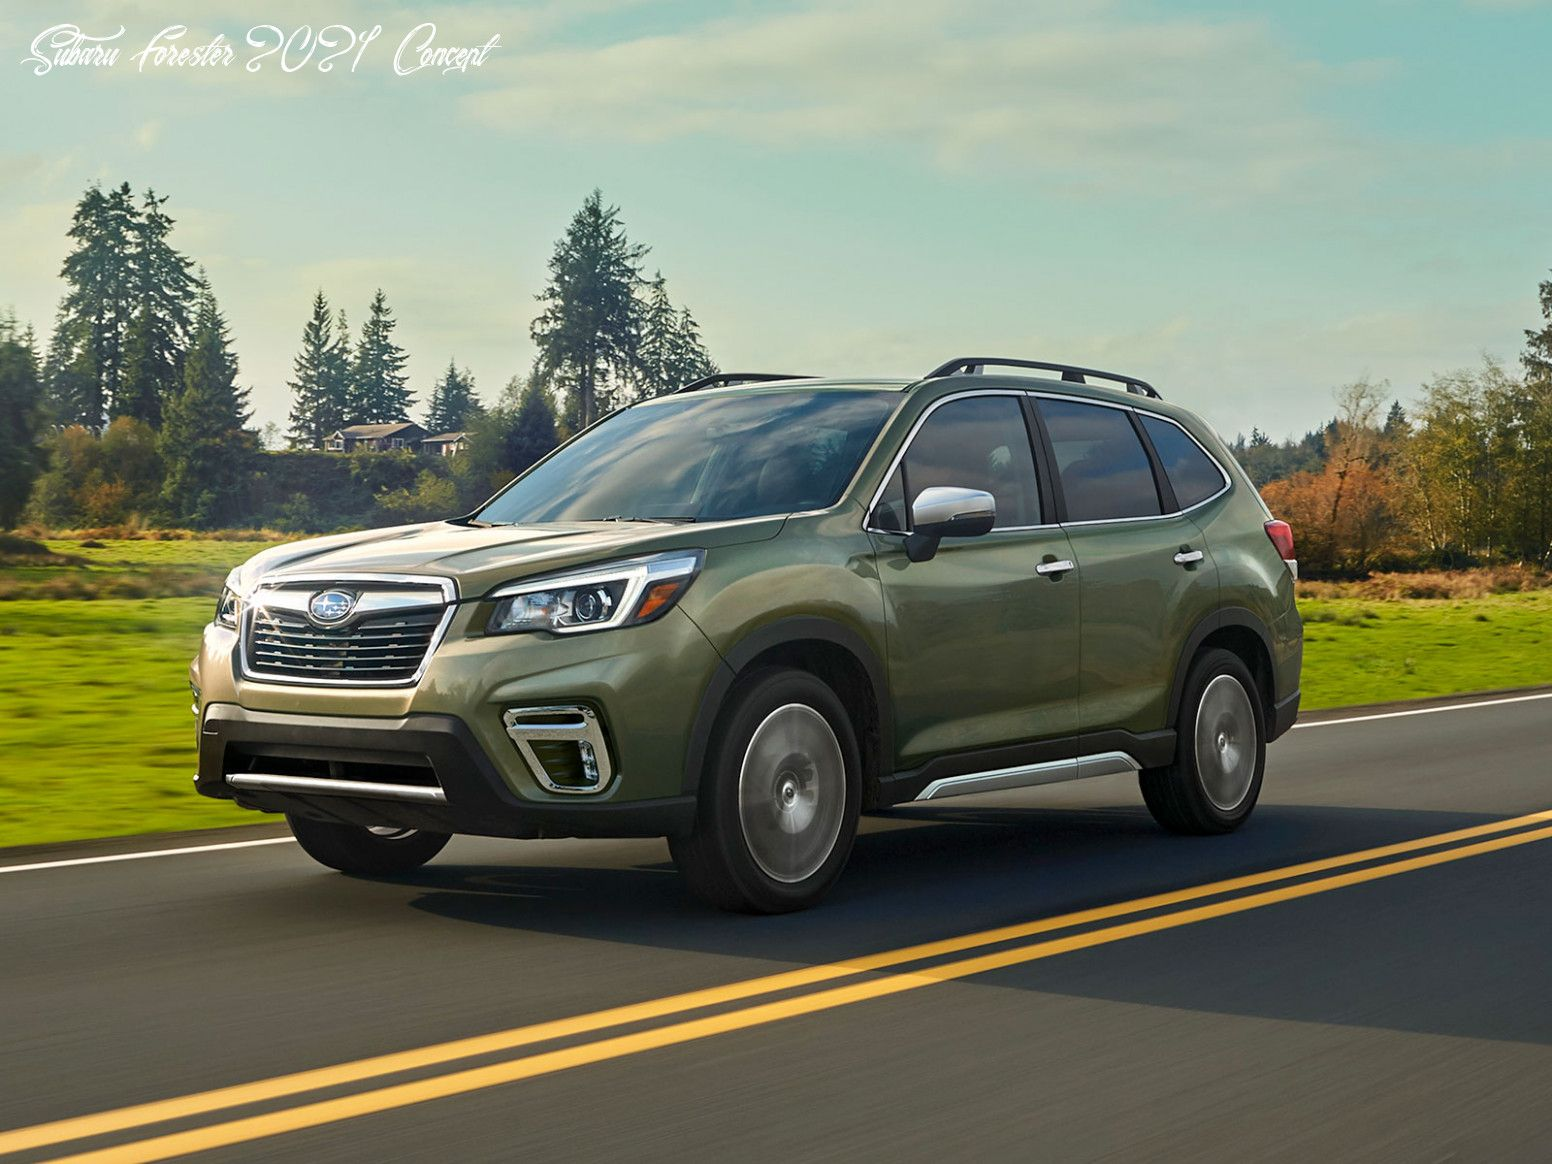 Subaru Forester 2021 Concept Rumors In 2020 Subaru Forester Subaru Suv